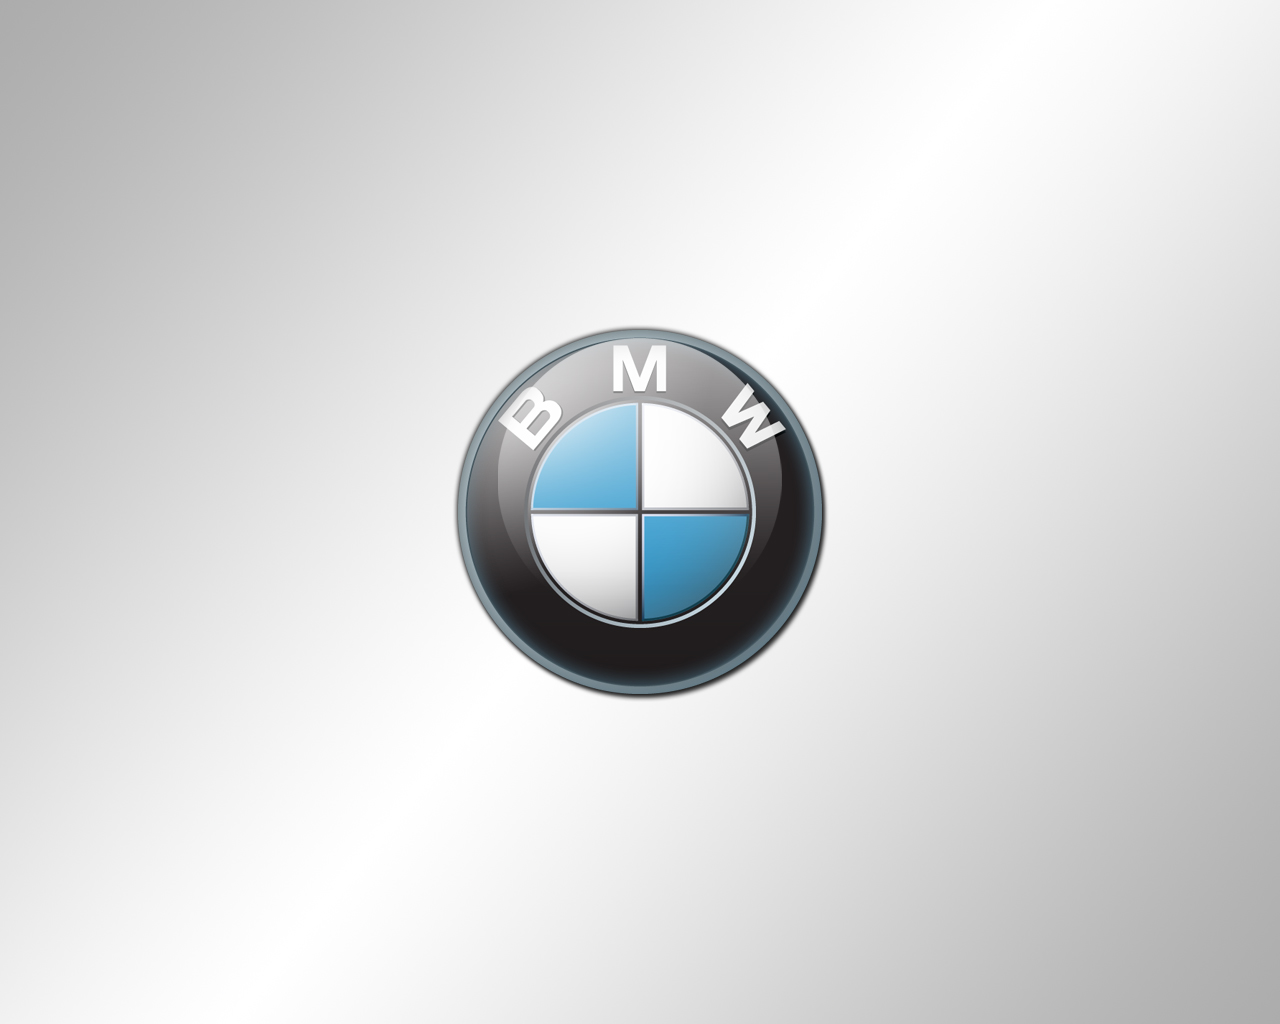 BMW Wallpaper by b-a88 on DeviantArt